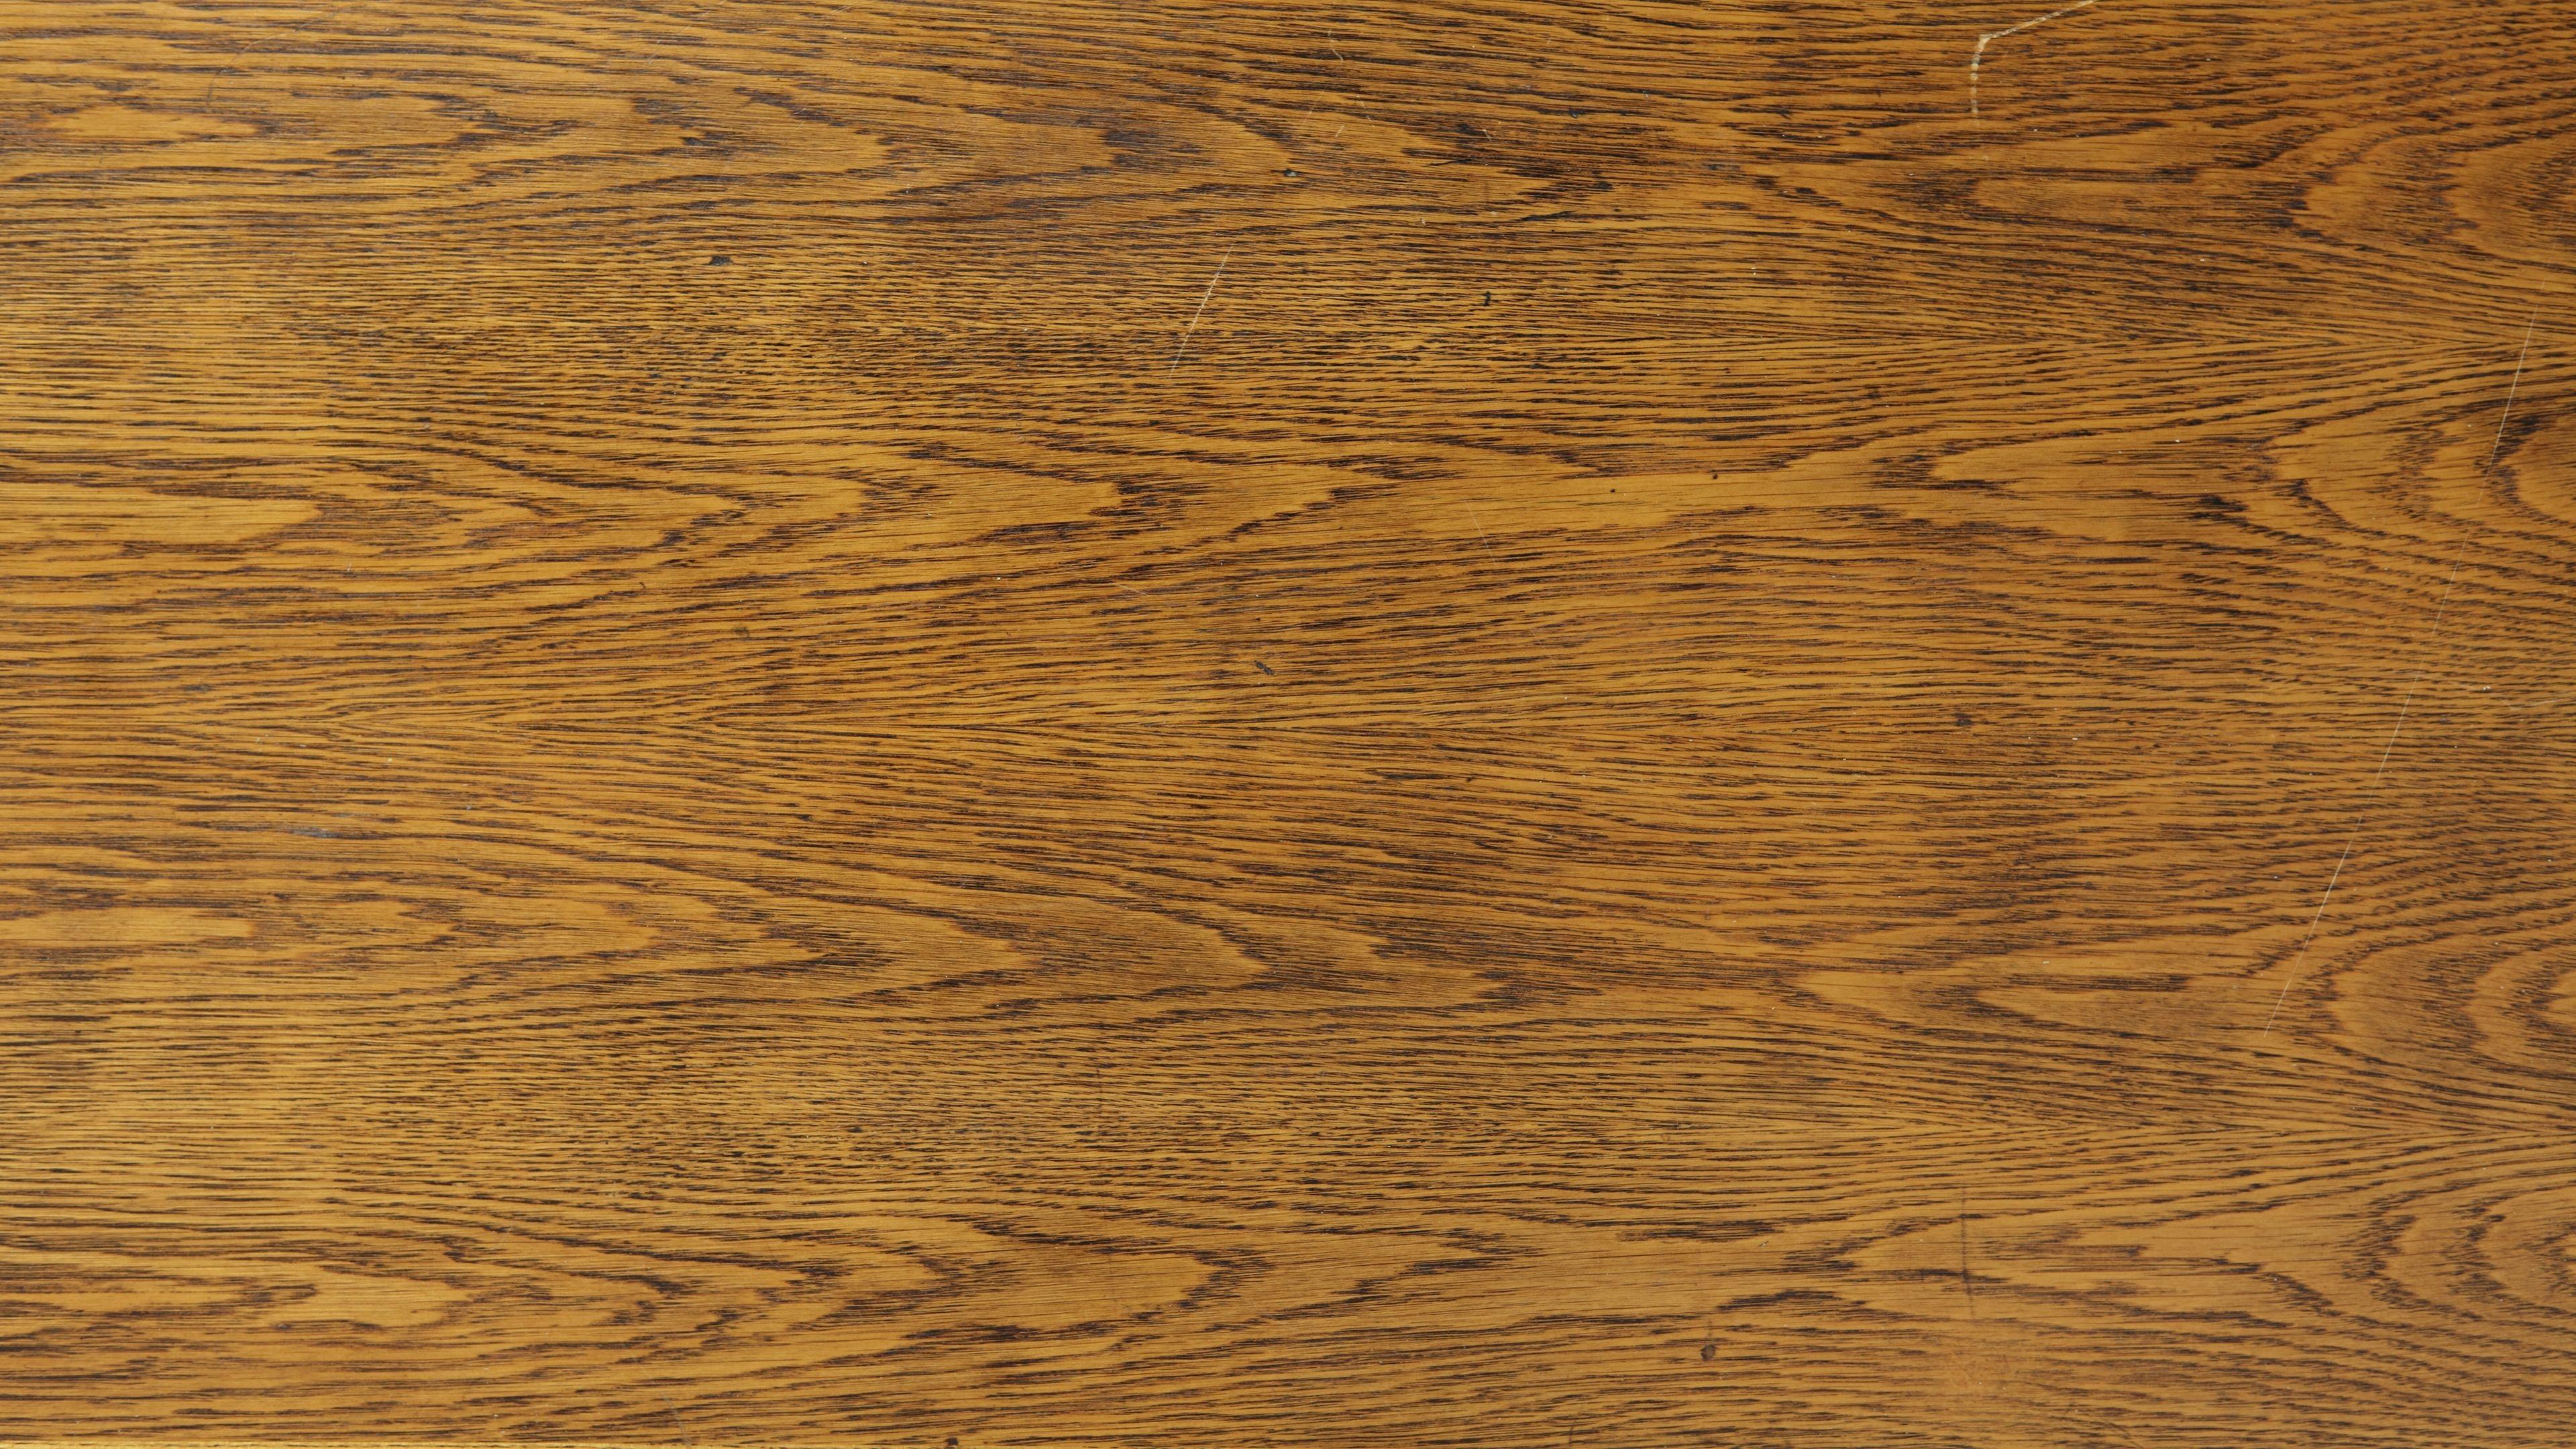 schreibtisch holz stock hartholz tapete bodenbelag holzboden laminatboden holzbeize desktop bild - Hartholz Oder Laminatboden